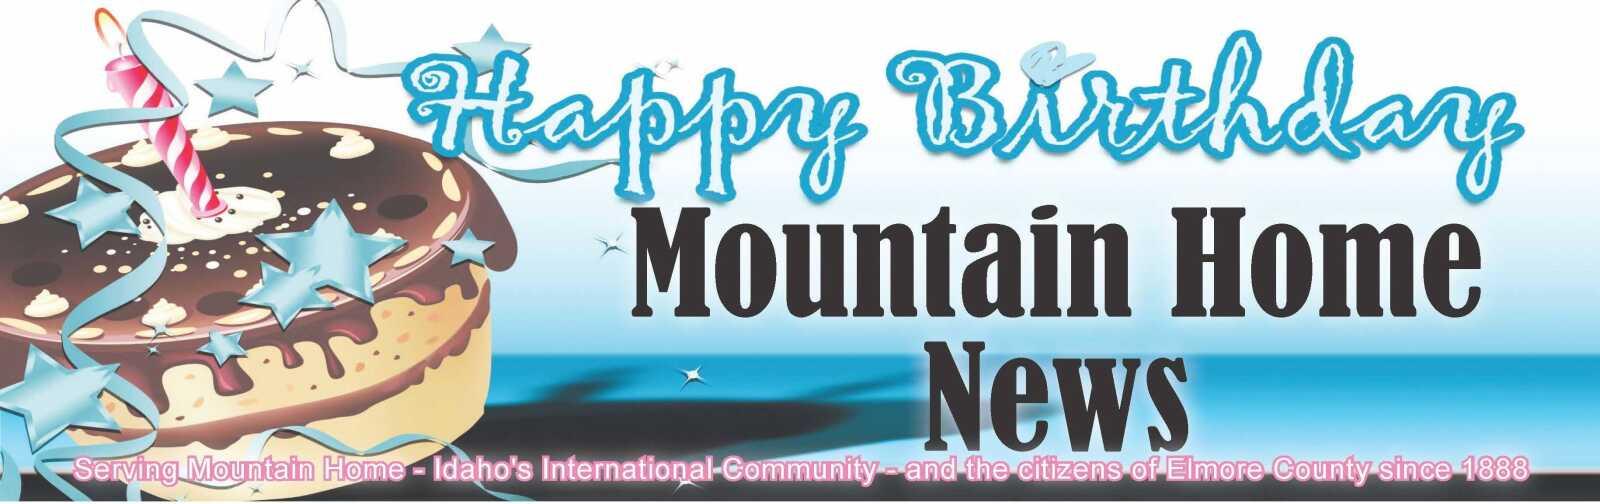 Mountain Home News